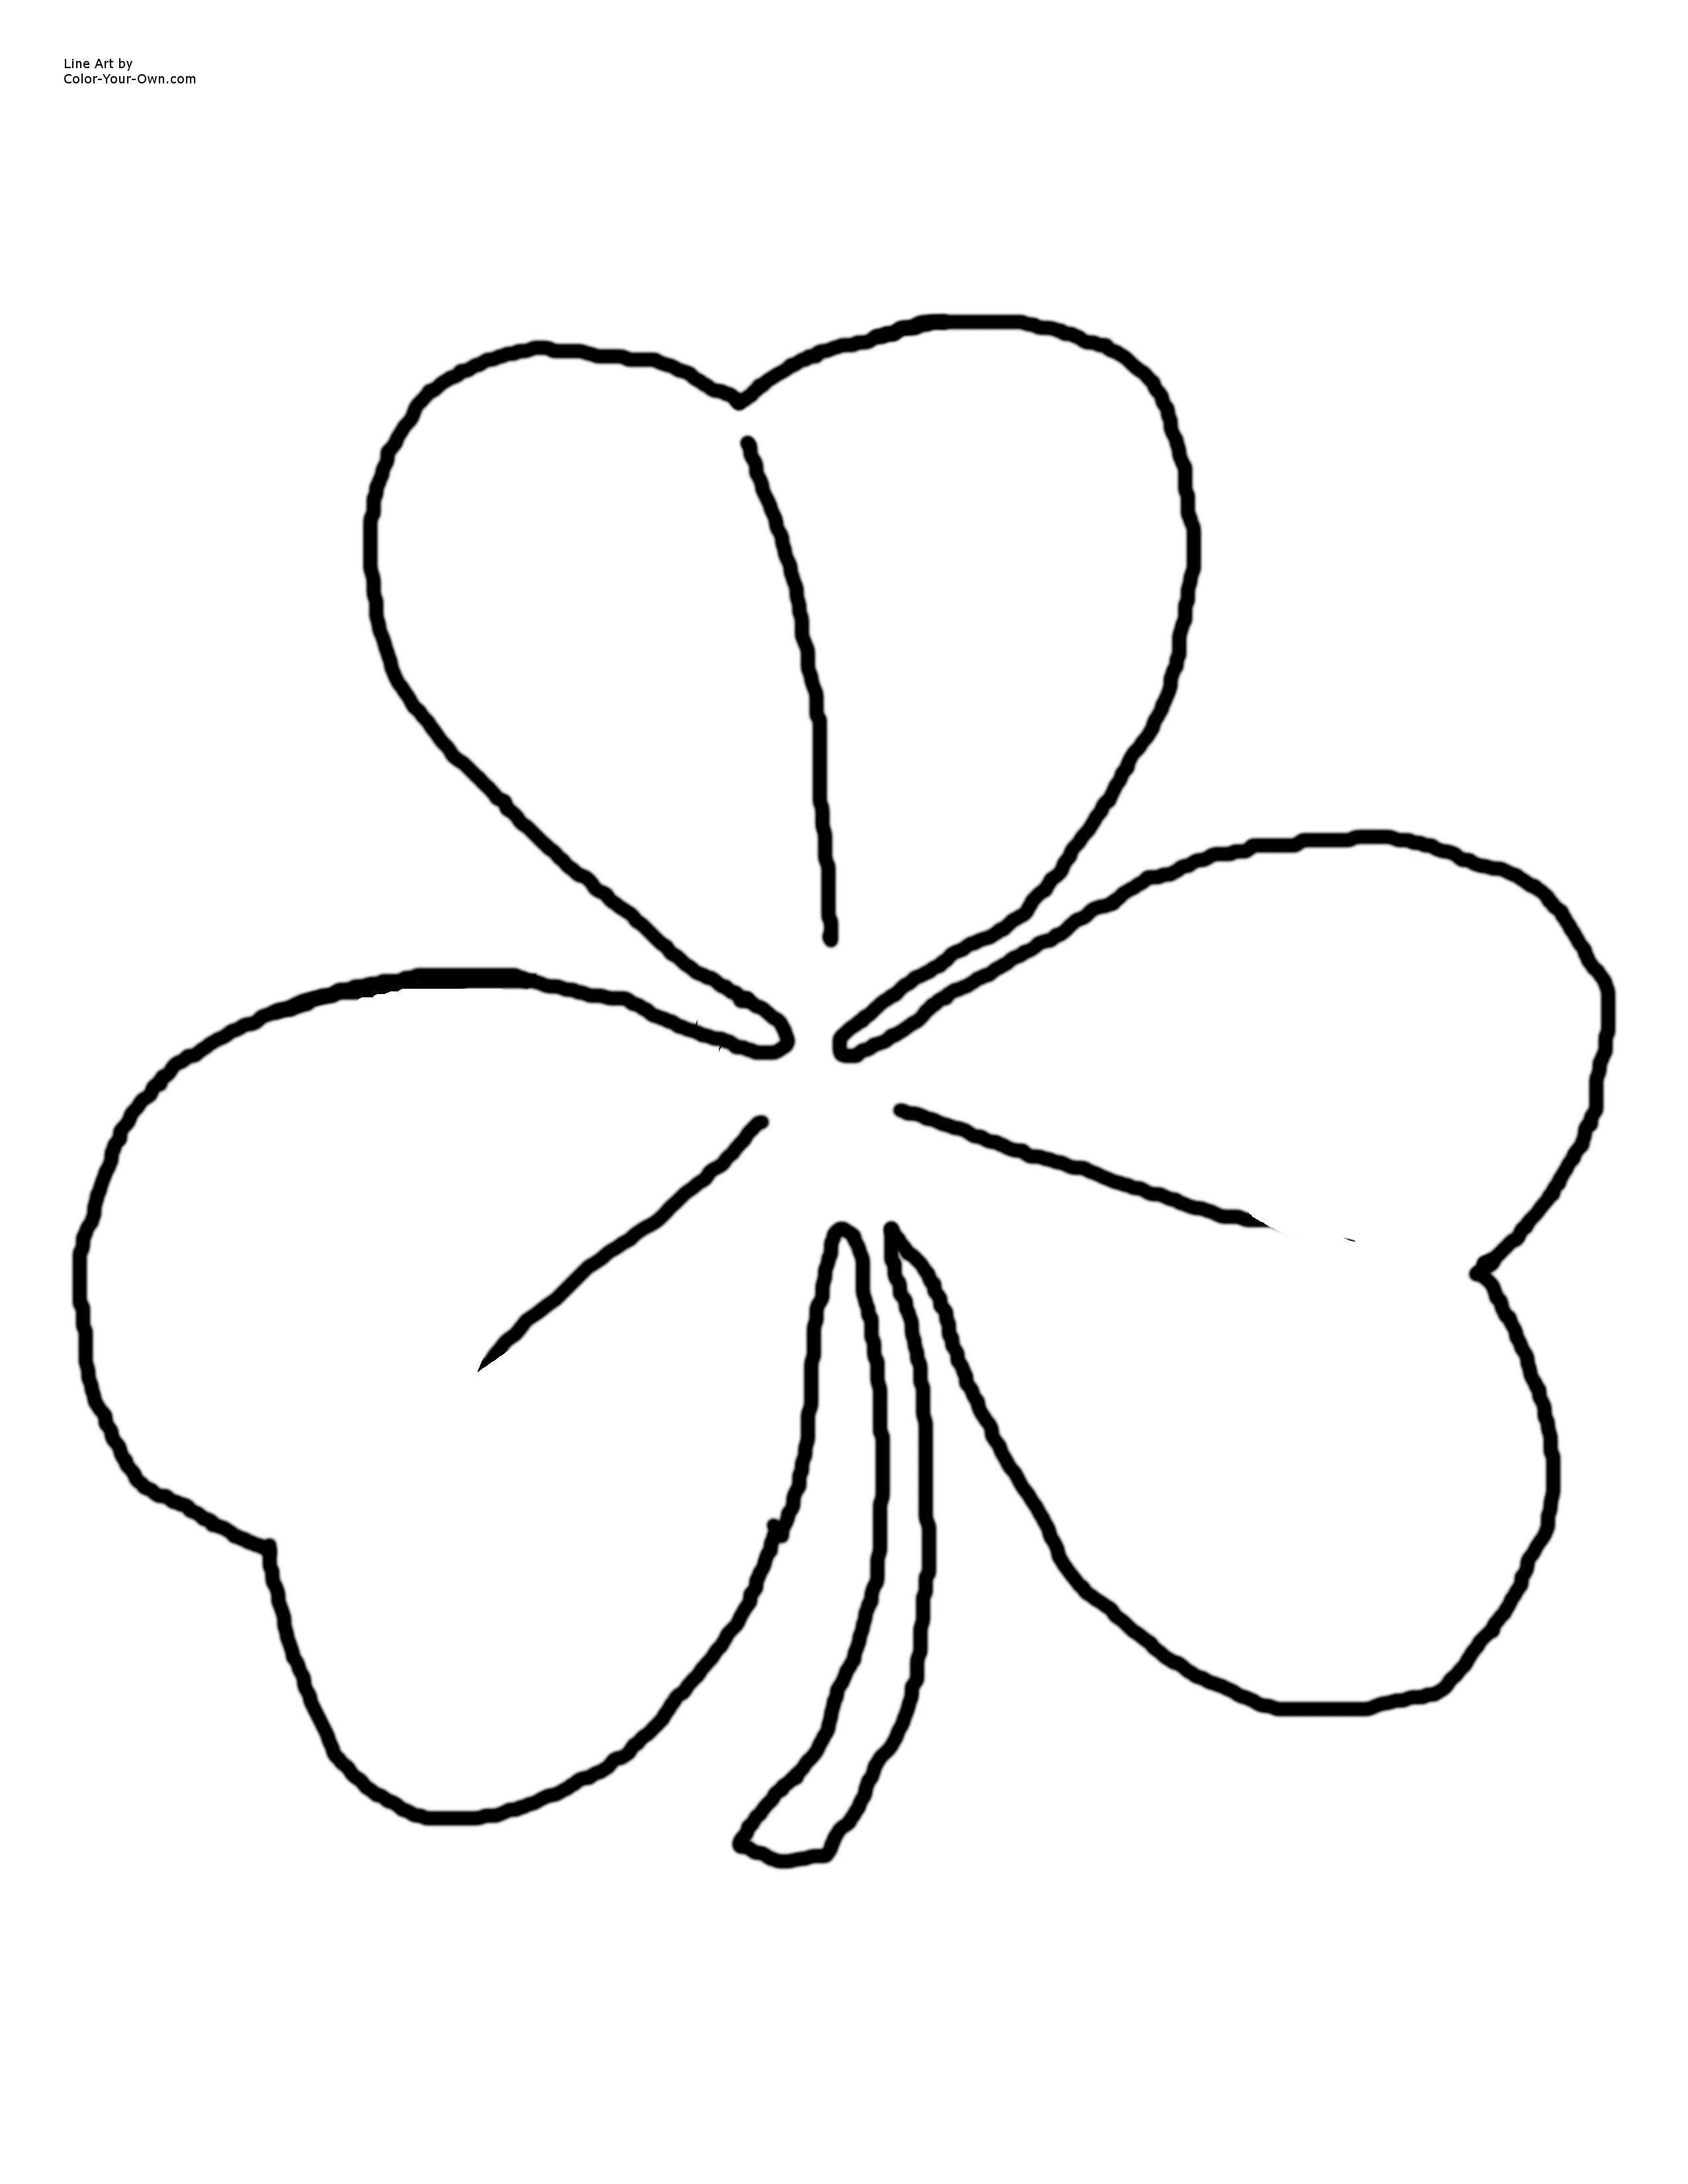 Irish Shamrock Coloring Page Free Stencils Printables Coloring Pages Free Coloring Pages